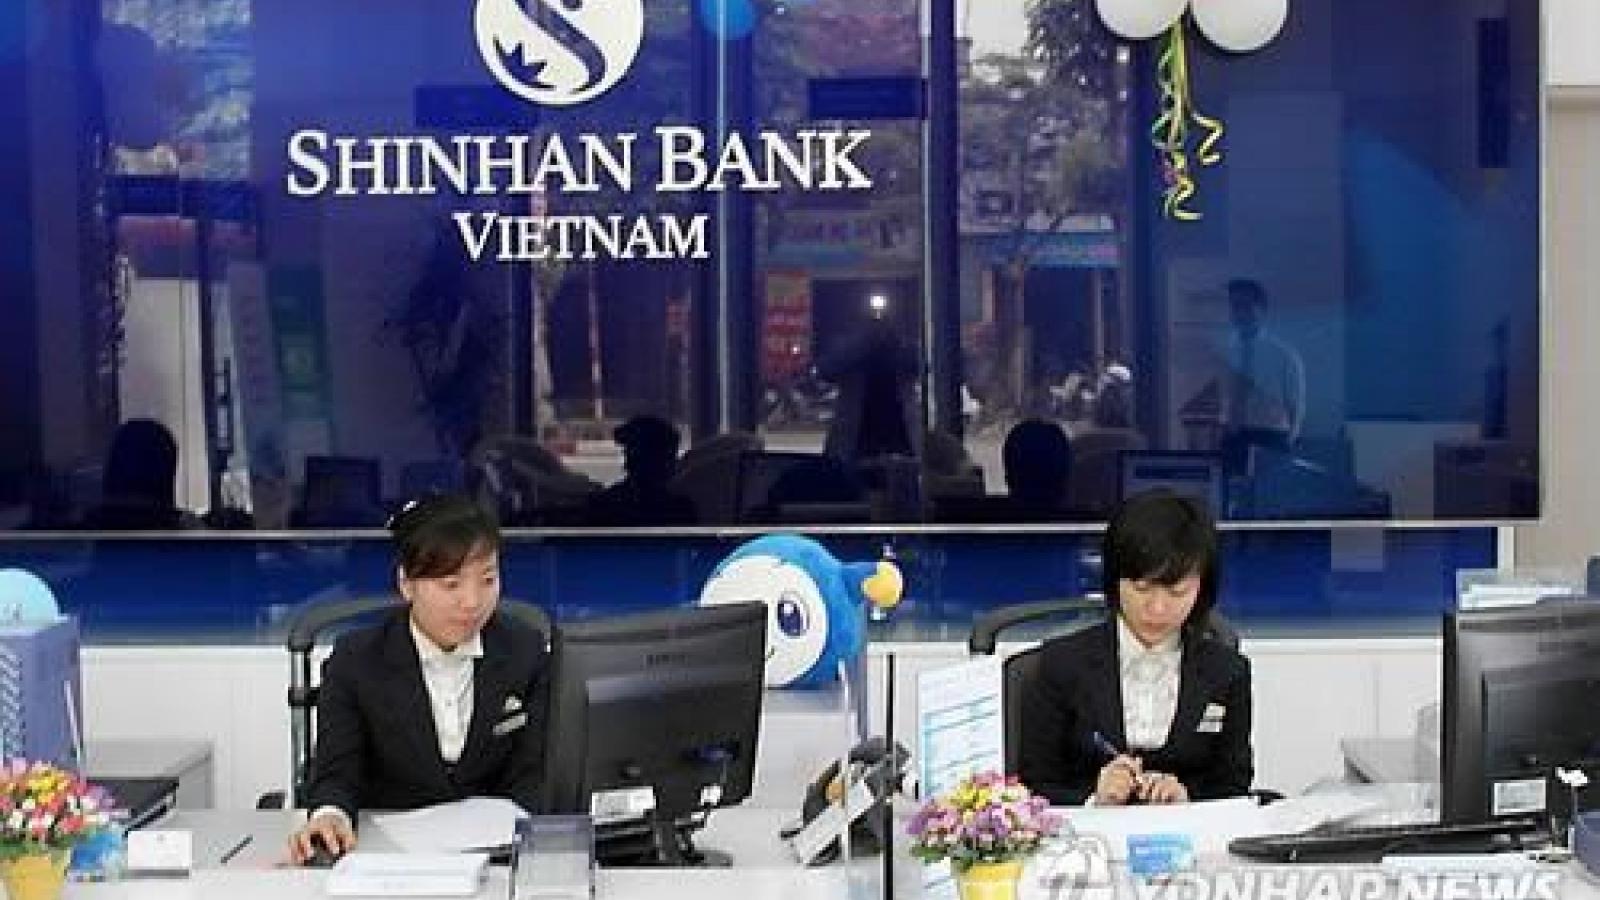 Shinhan Bank Vietnam acquires ANZ Vietnam's retail business